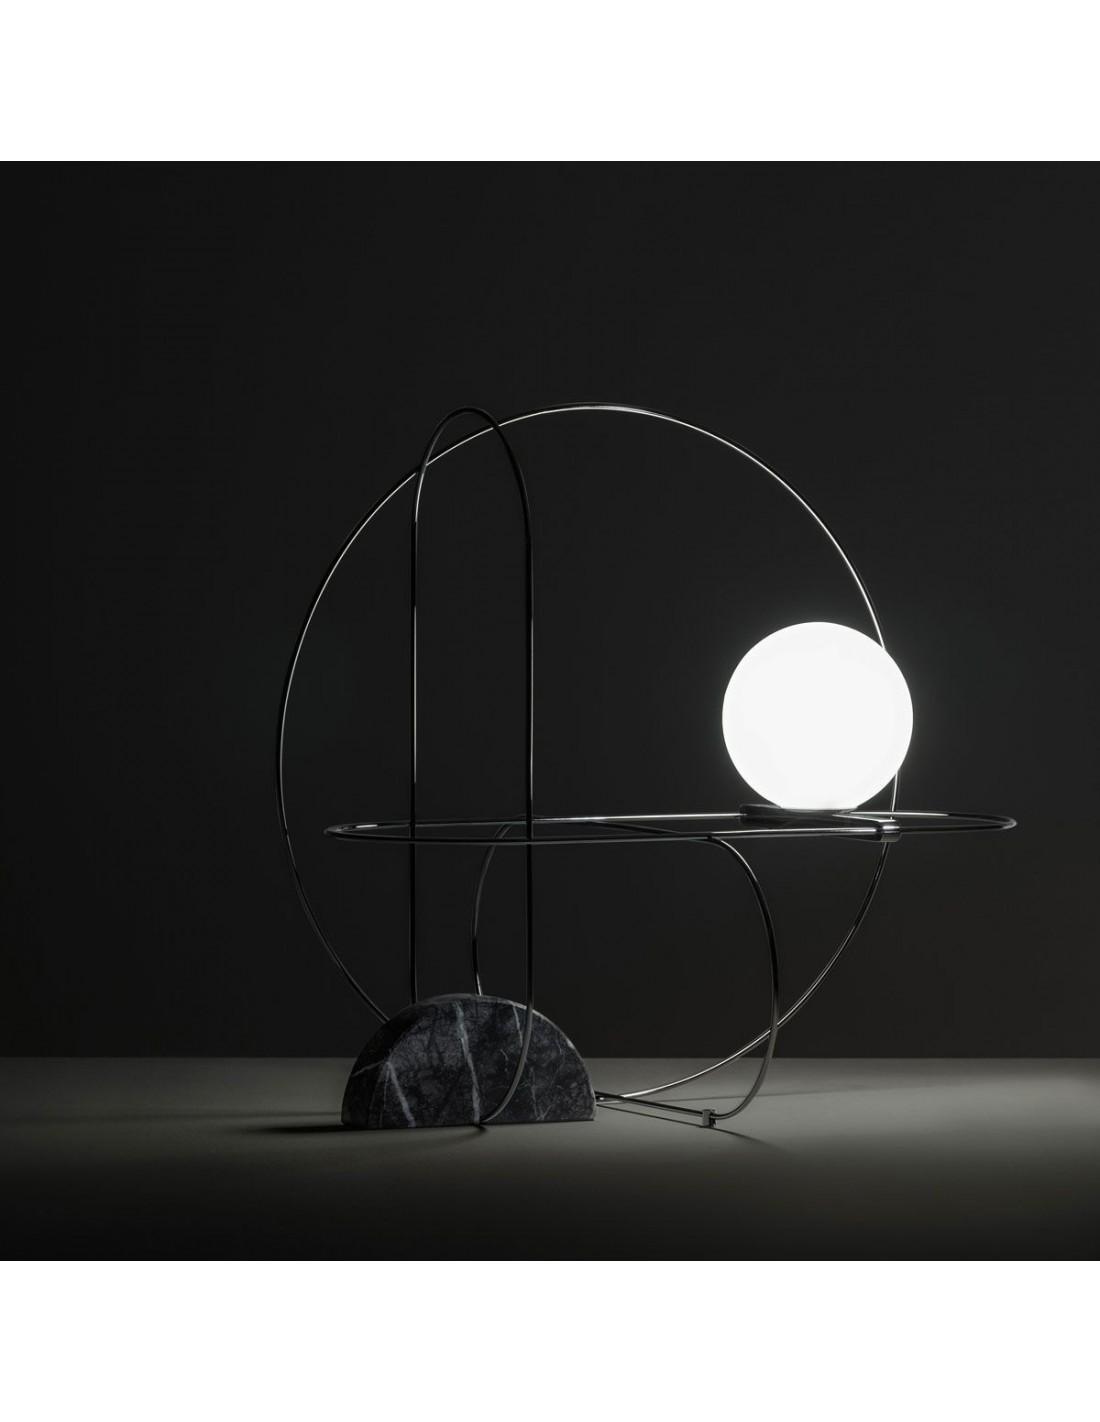 Lampe de table Setareh chrome Fontana Arte mise en scène